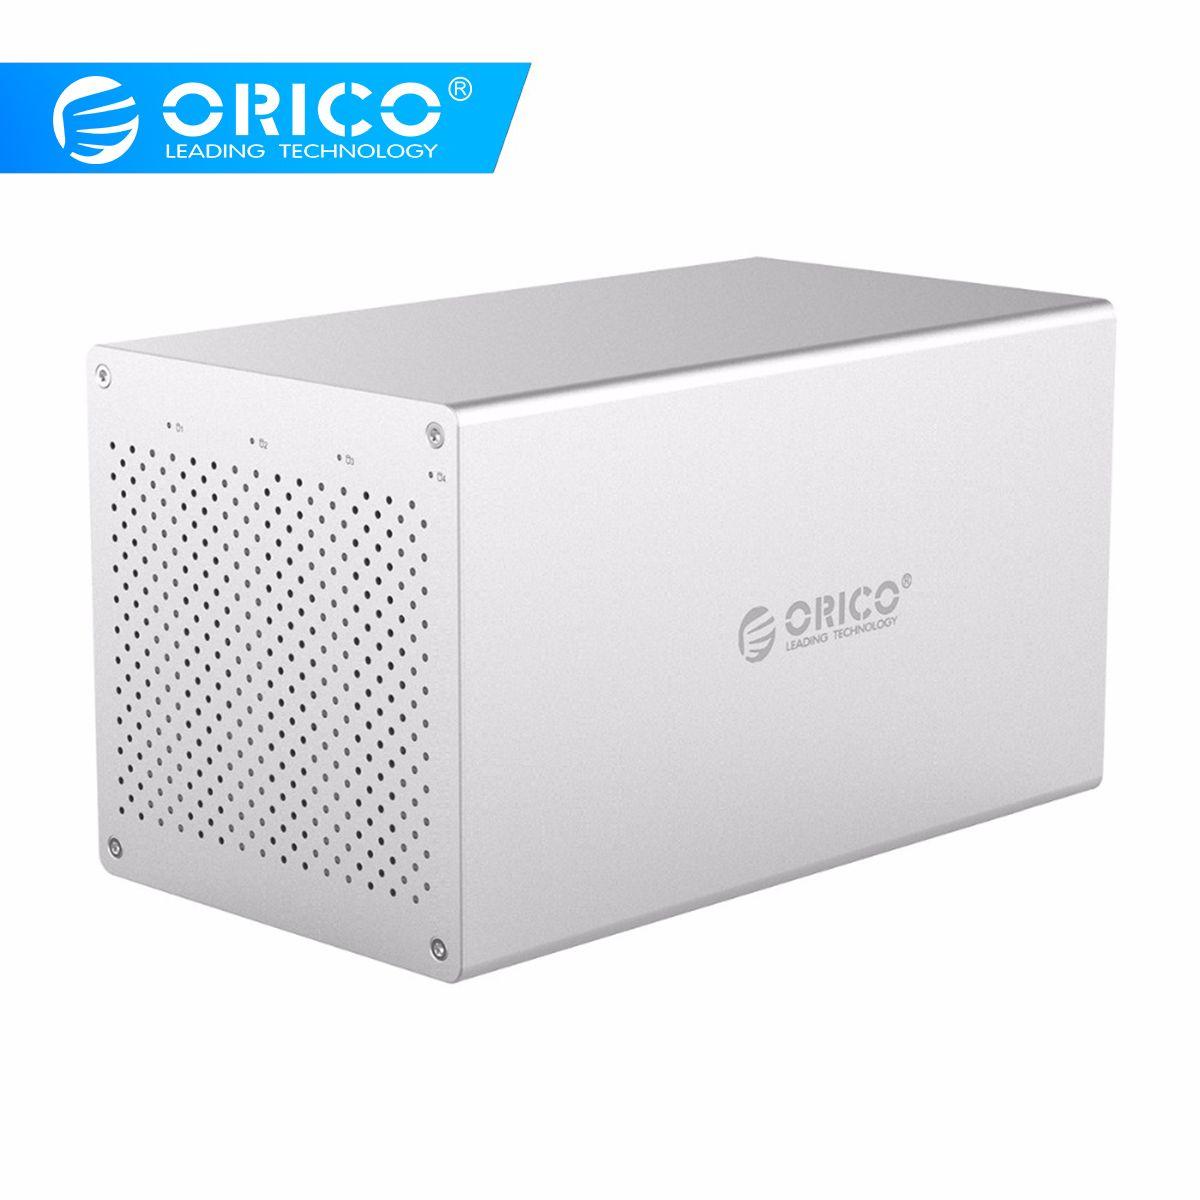 ORICO SATA zu USB 3.0 3,5